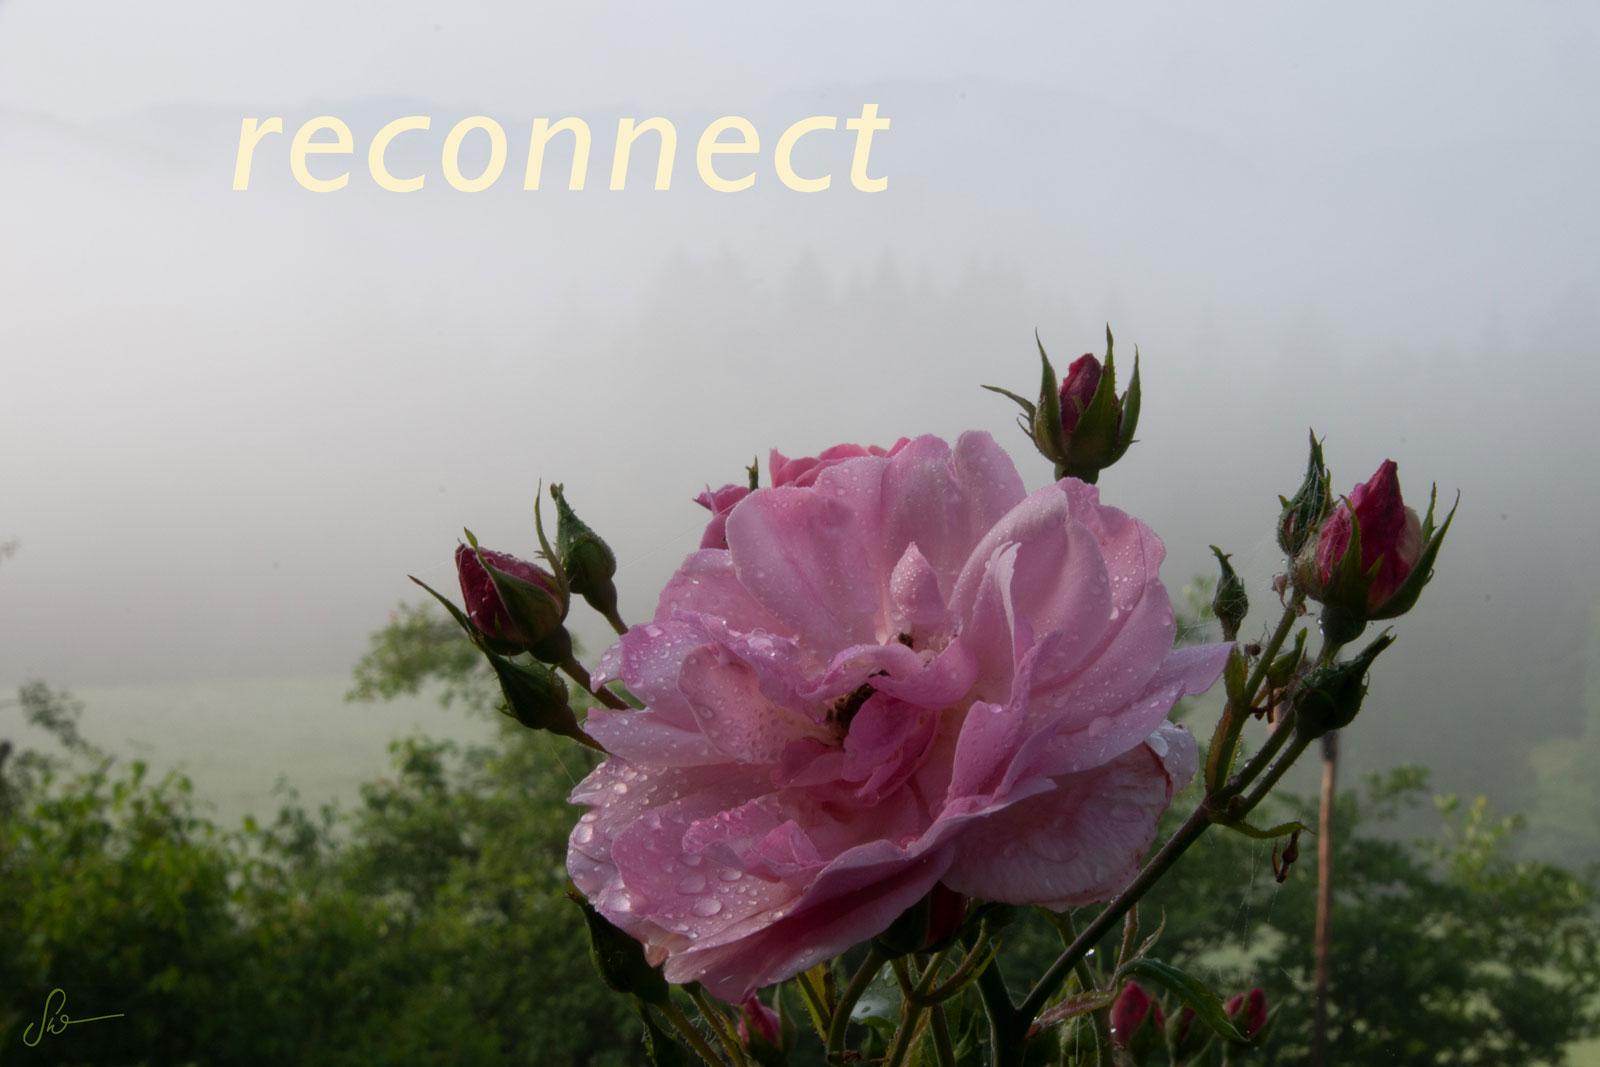 Rose-Nantes_3710-14A_sw_reconnect-v2